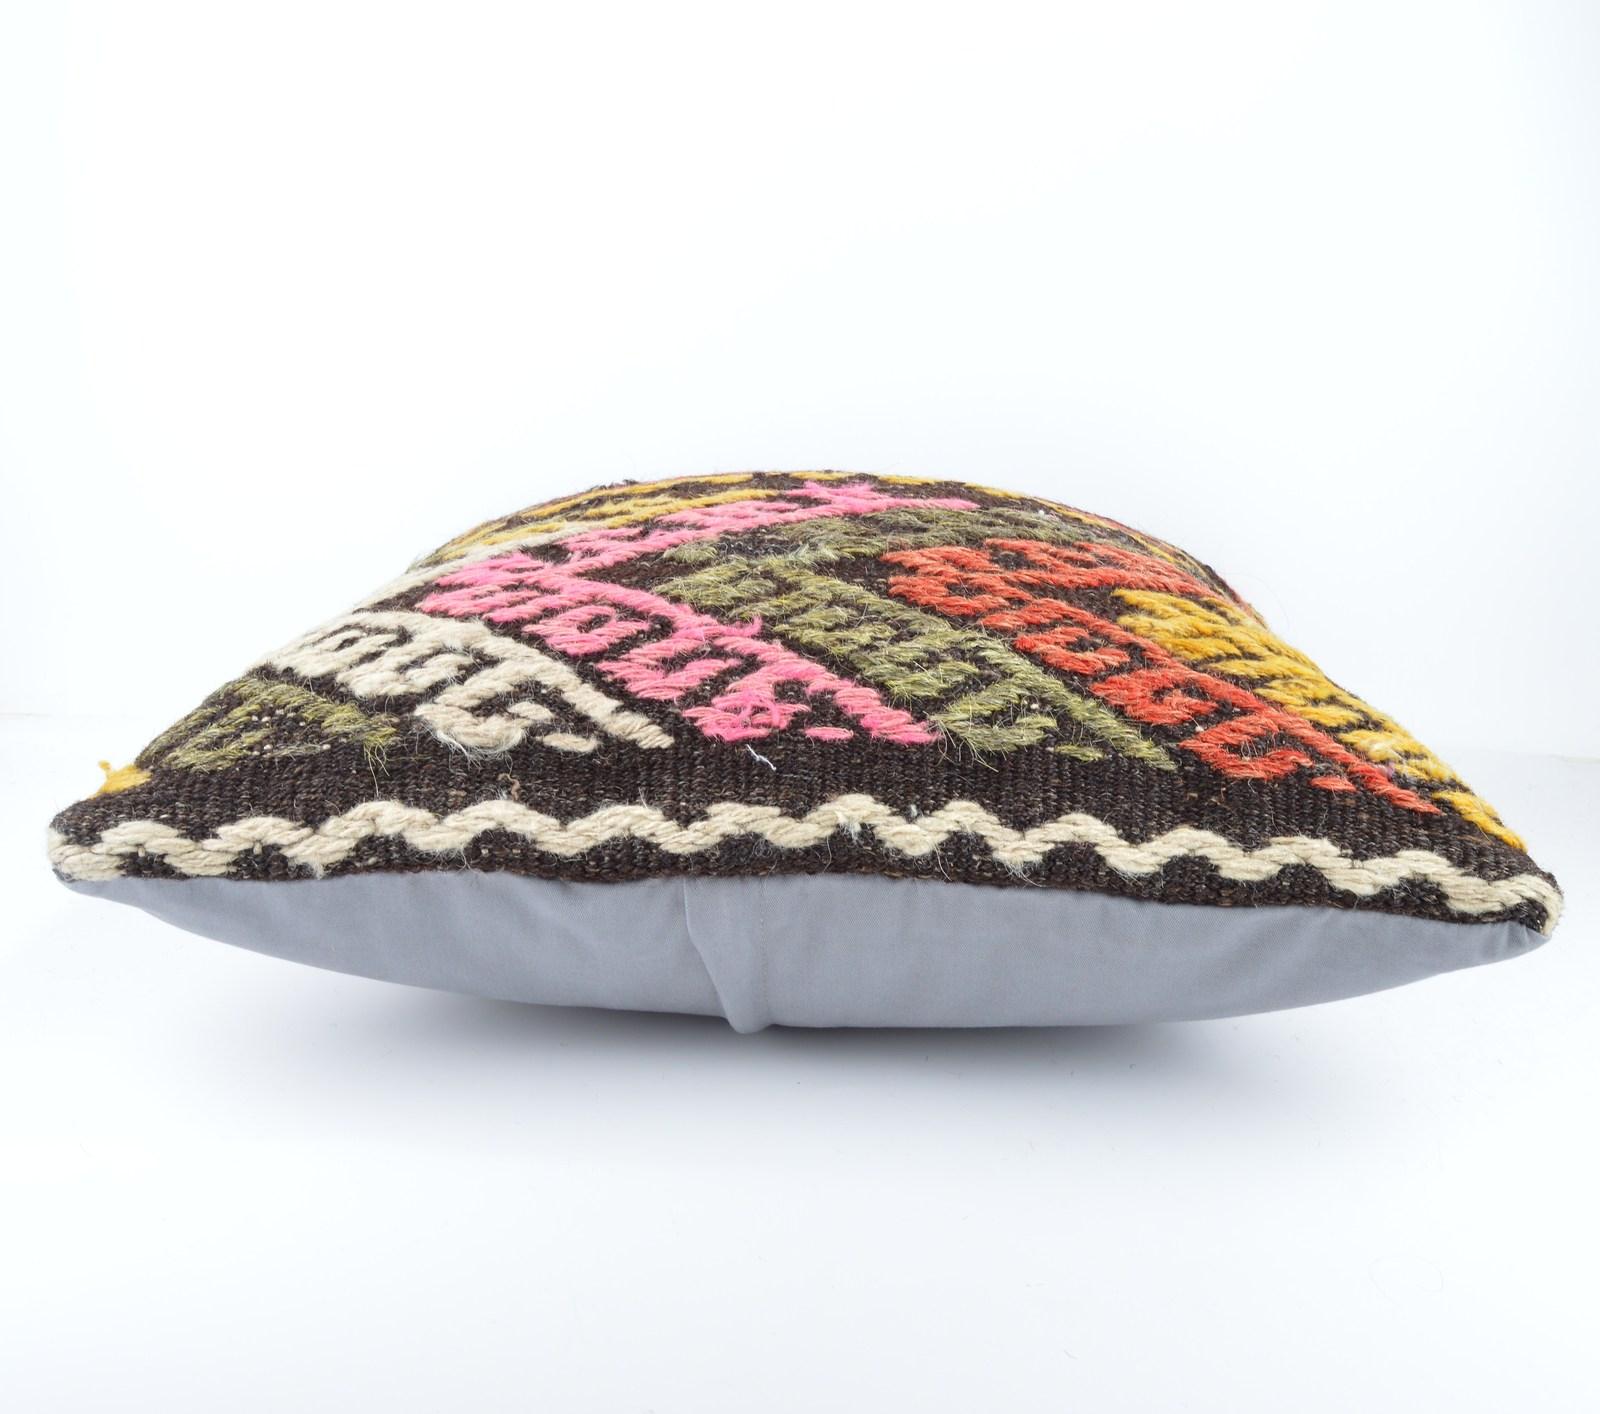 20x20 Handwoven Kilim Pillow Throw Pillow kilim cushion cover decorative throw - Pillows